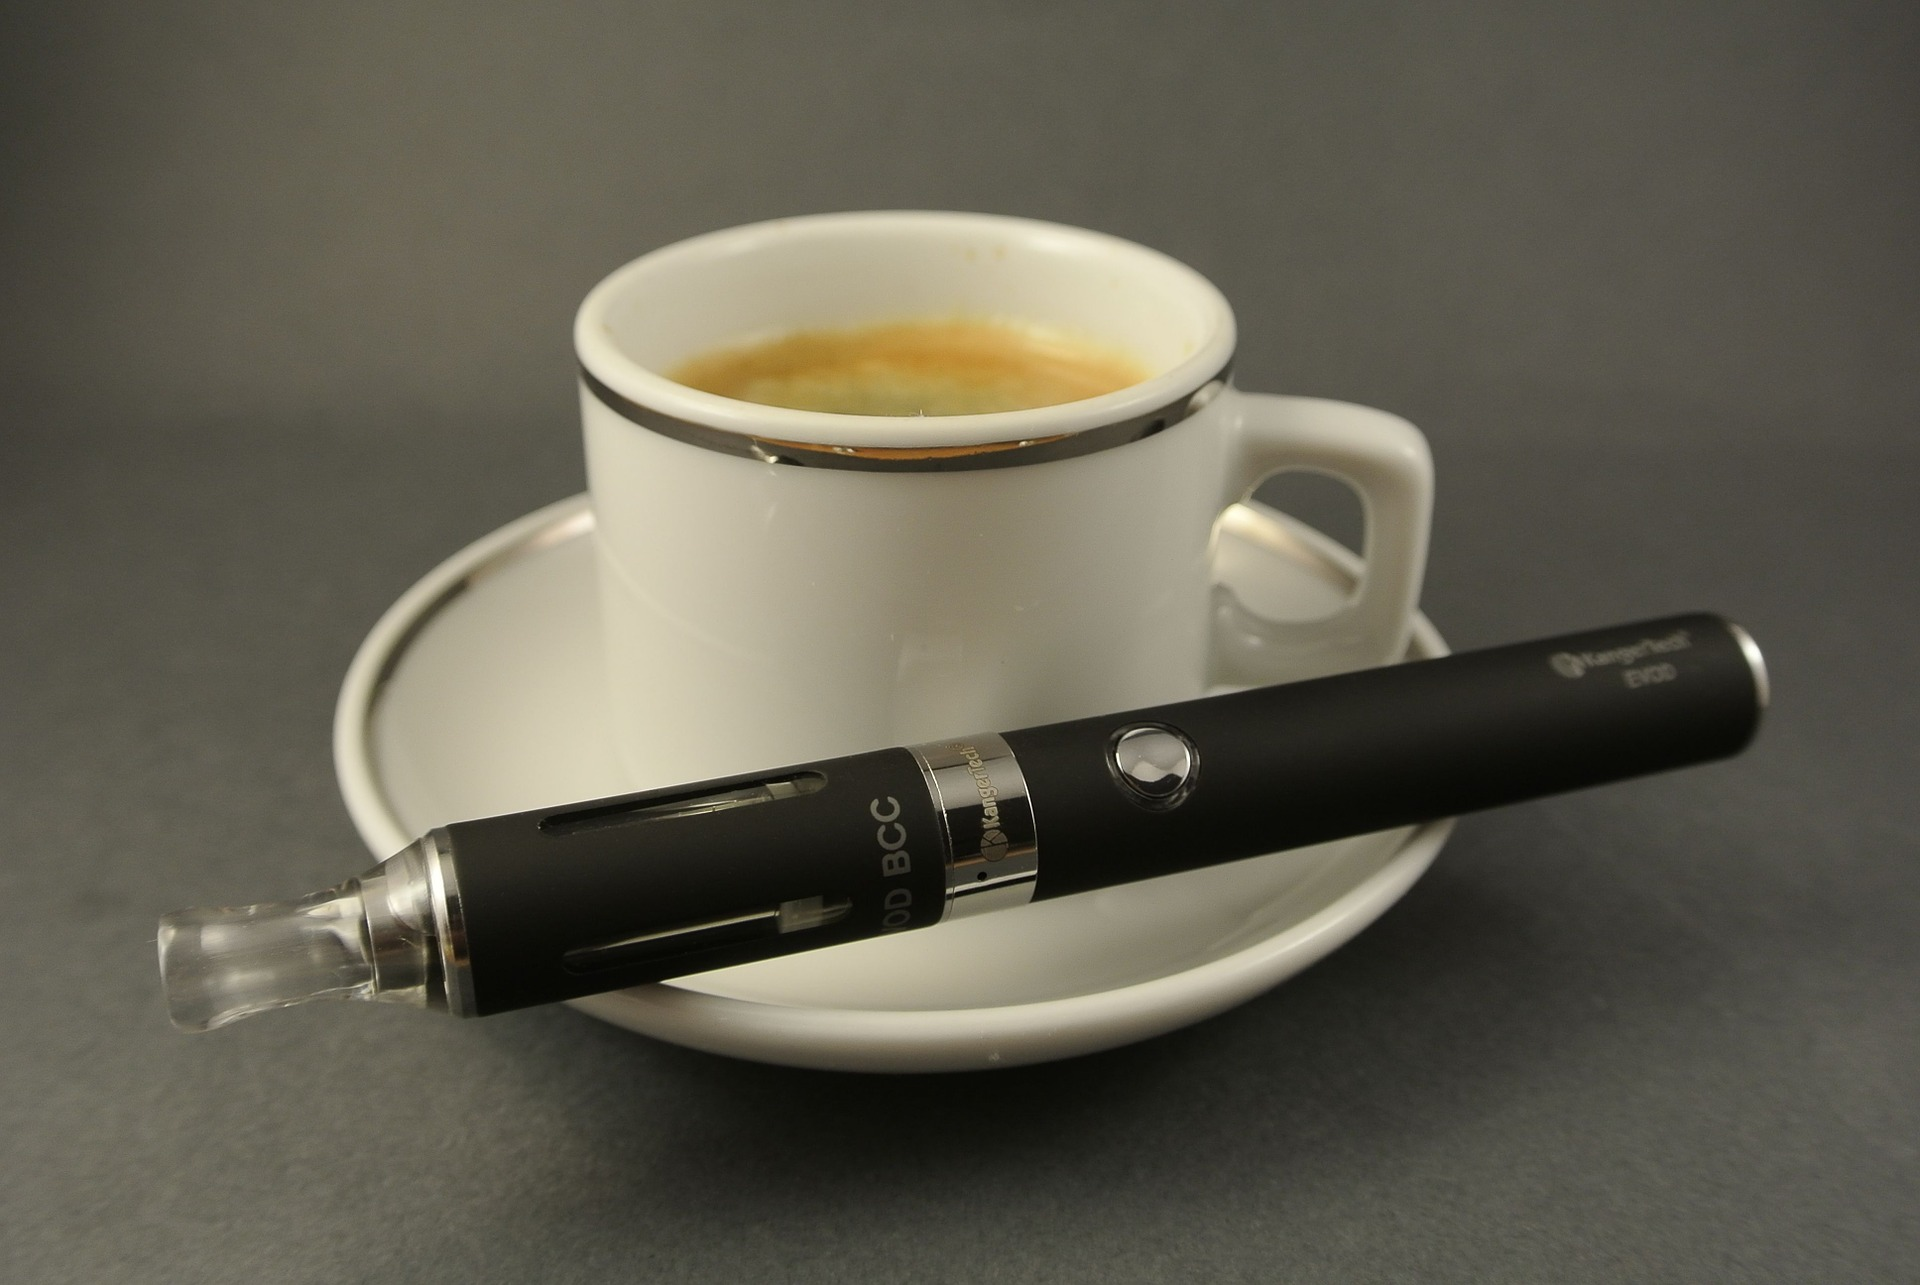 Hvilke fordele er der ved e-cigaretter?